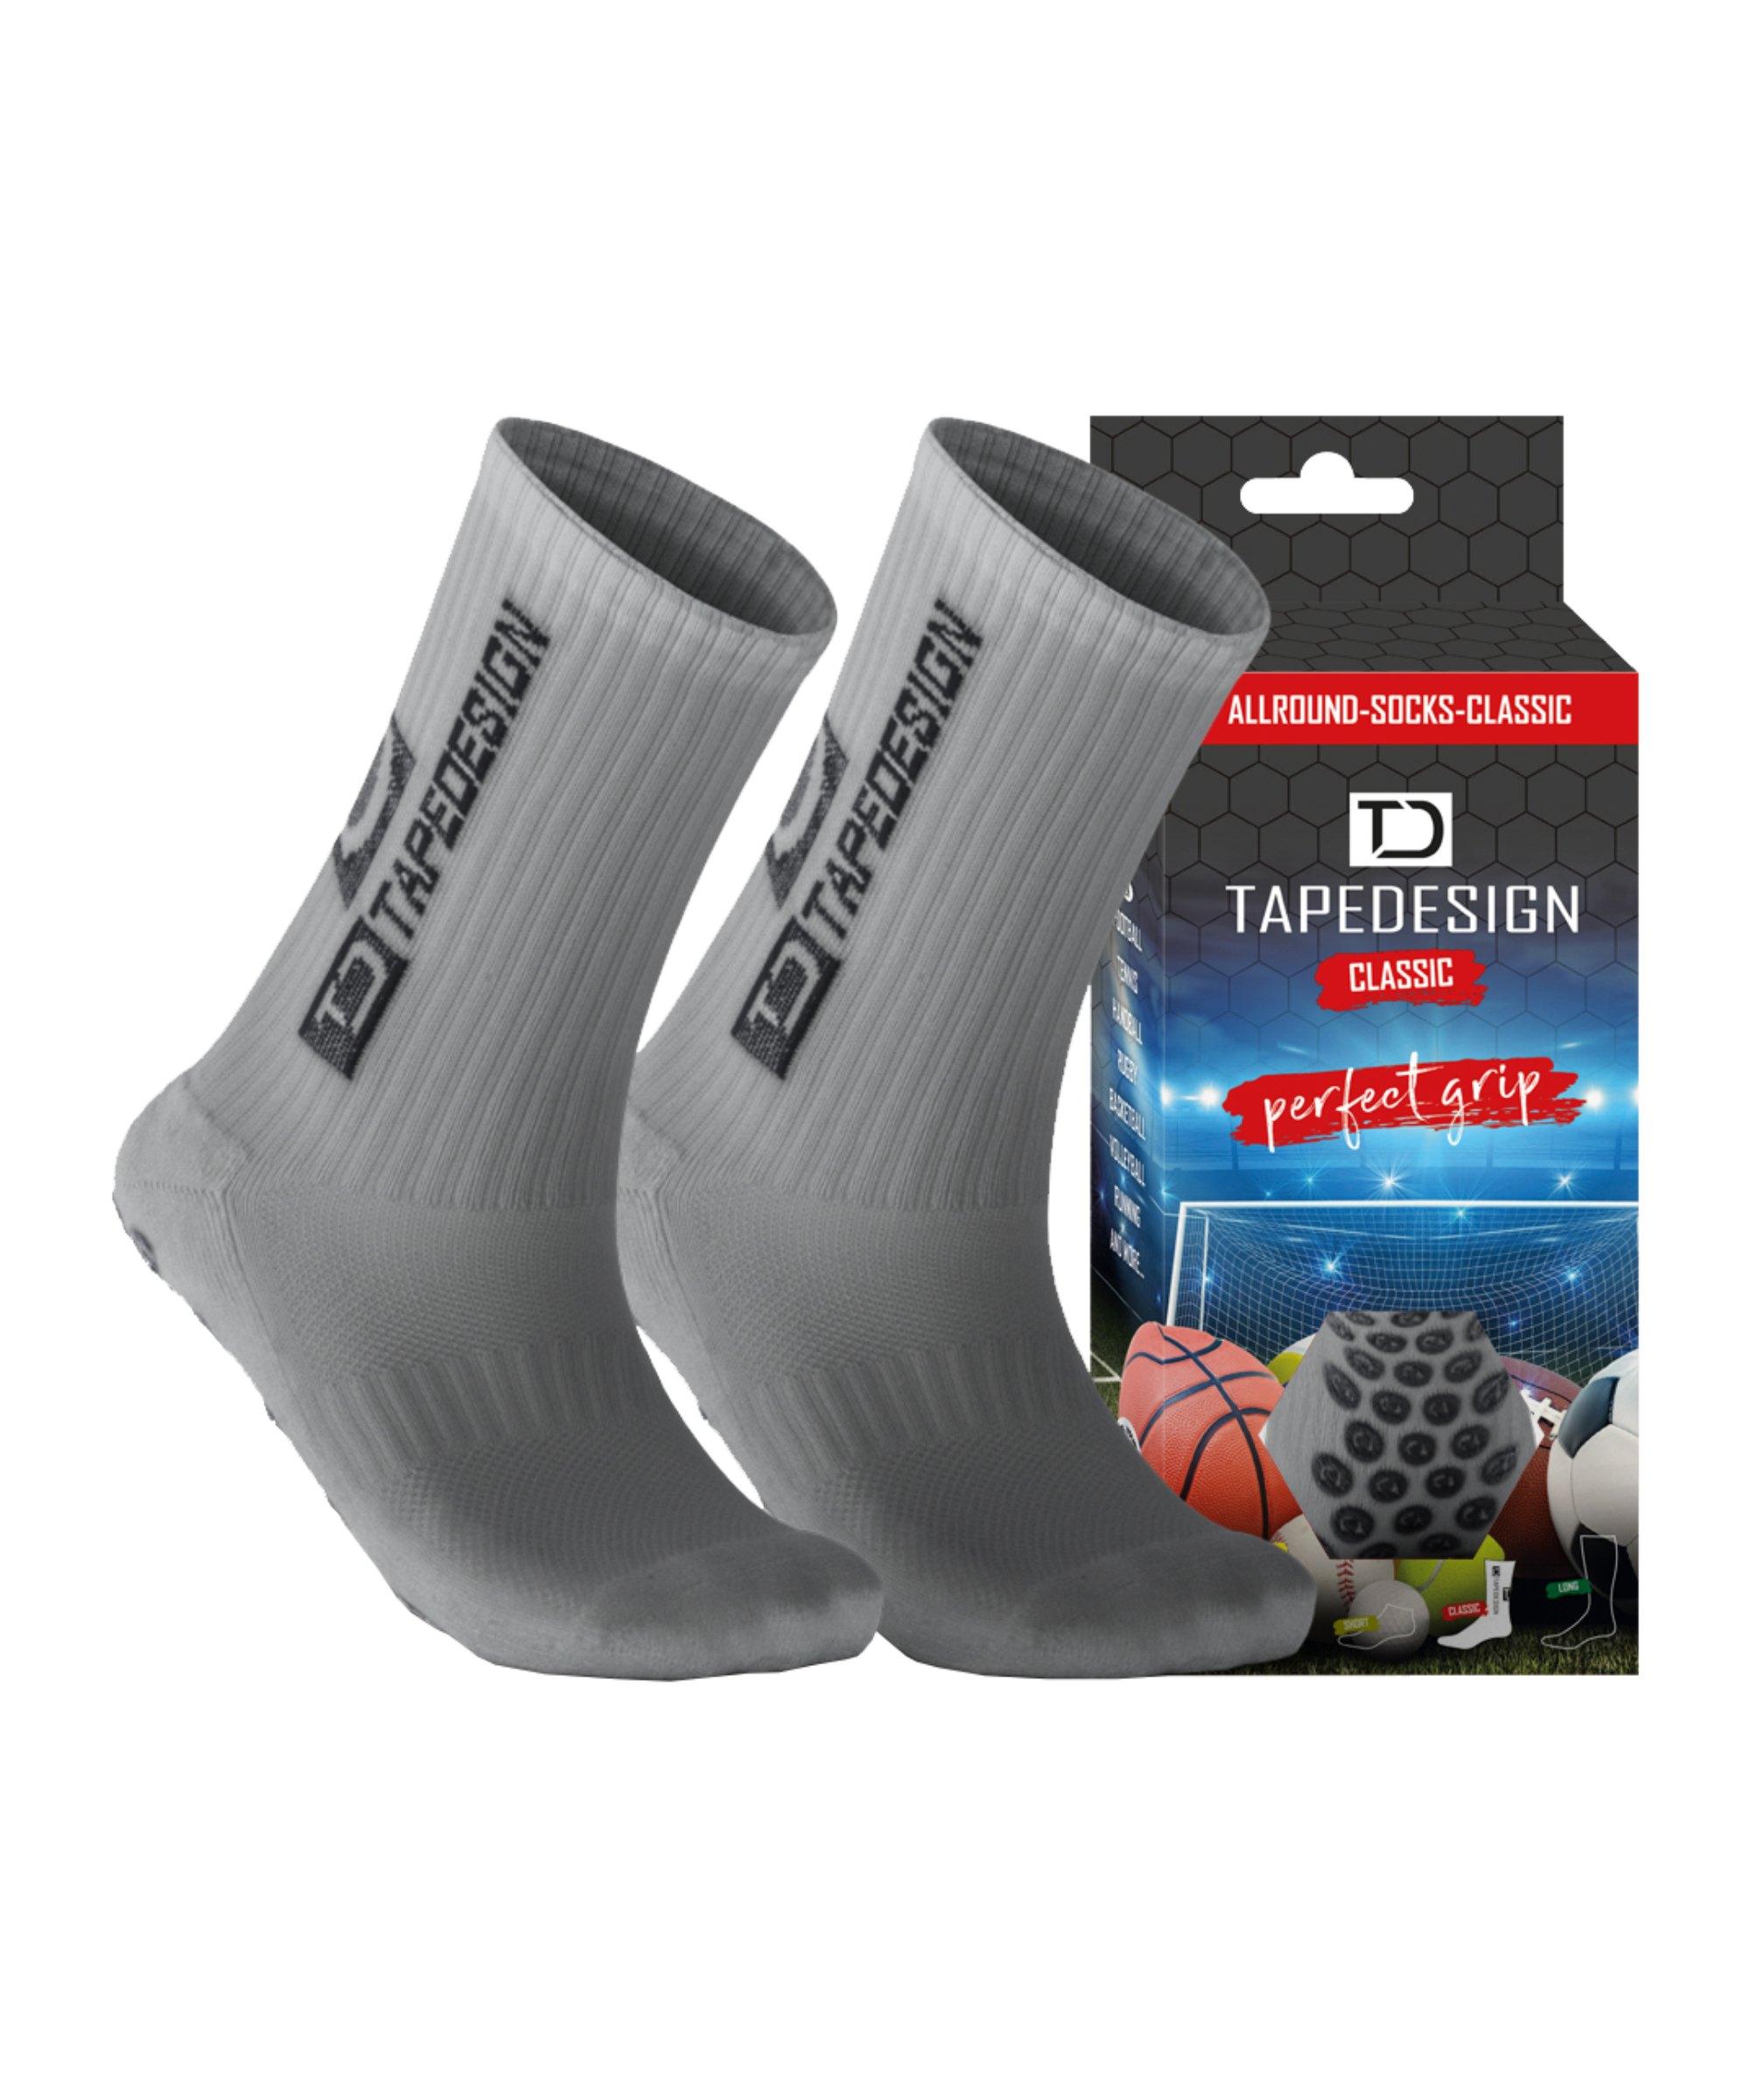 Tapedesign Gripsocks Socken Hellgrau F015 - grau